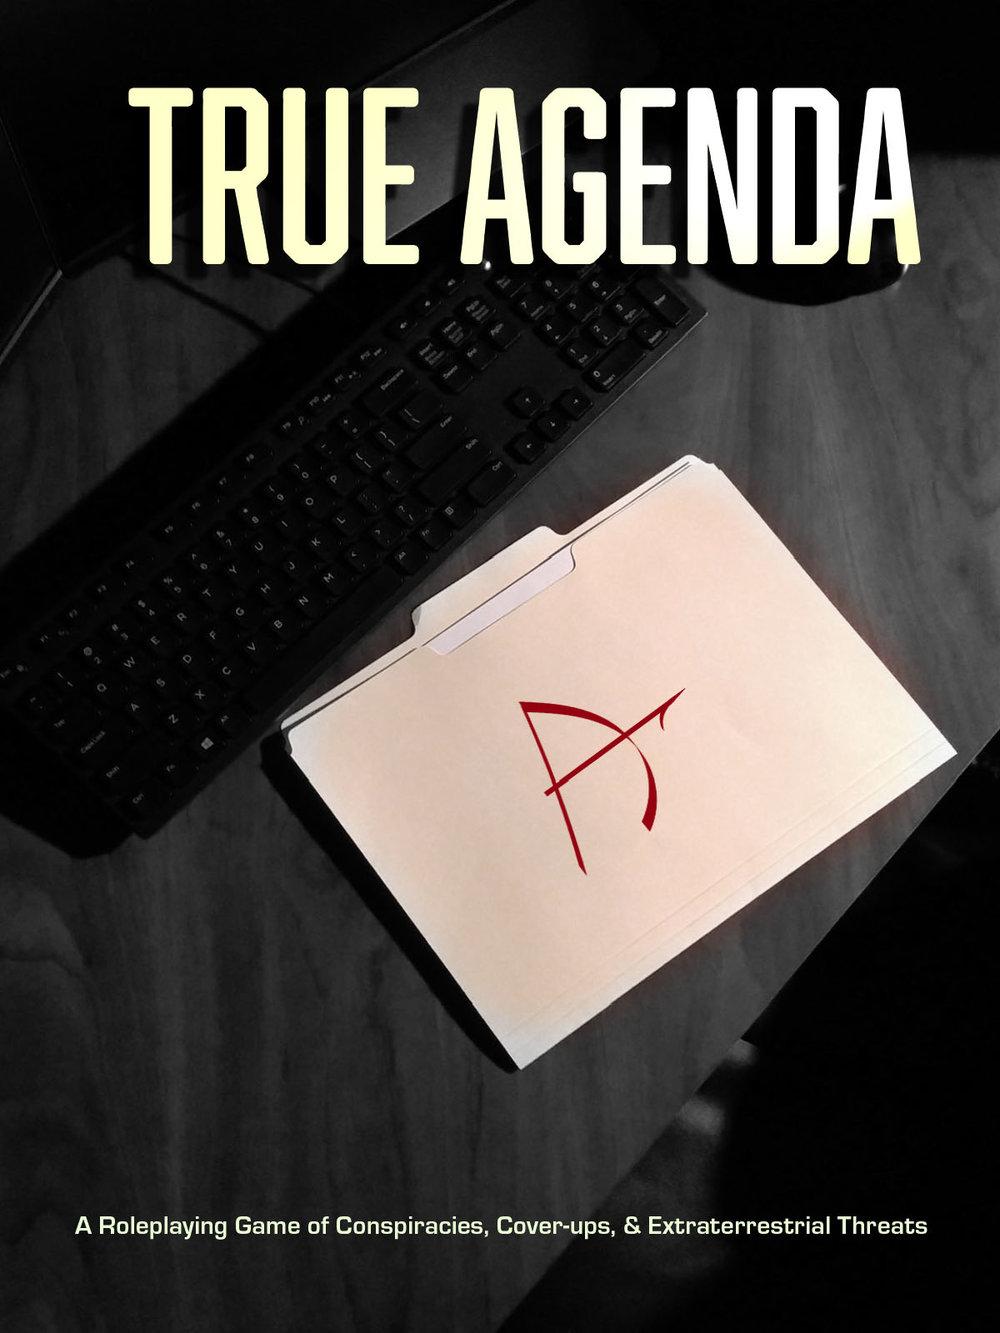 True Agenda Cover Art Final.jpg